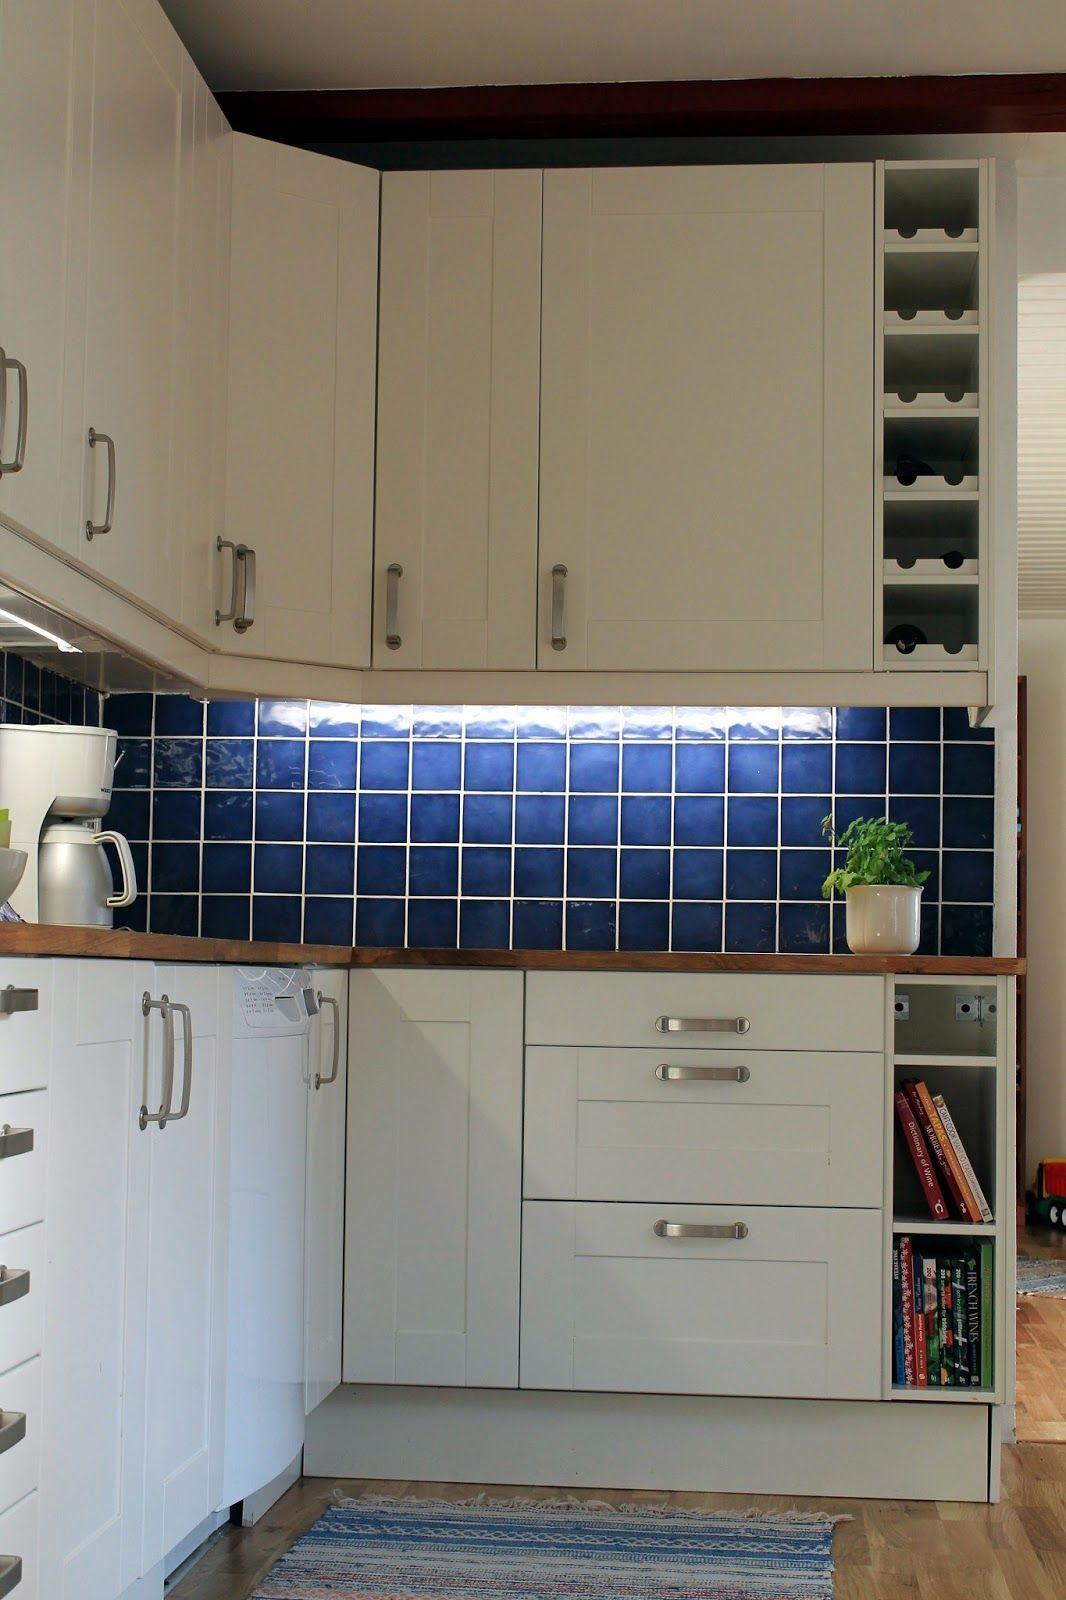 My Delights: blue kitchen tiles | Home | Pinterest | Kitchens, House ...